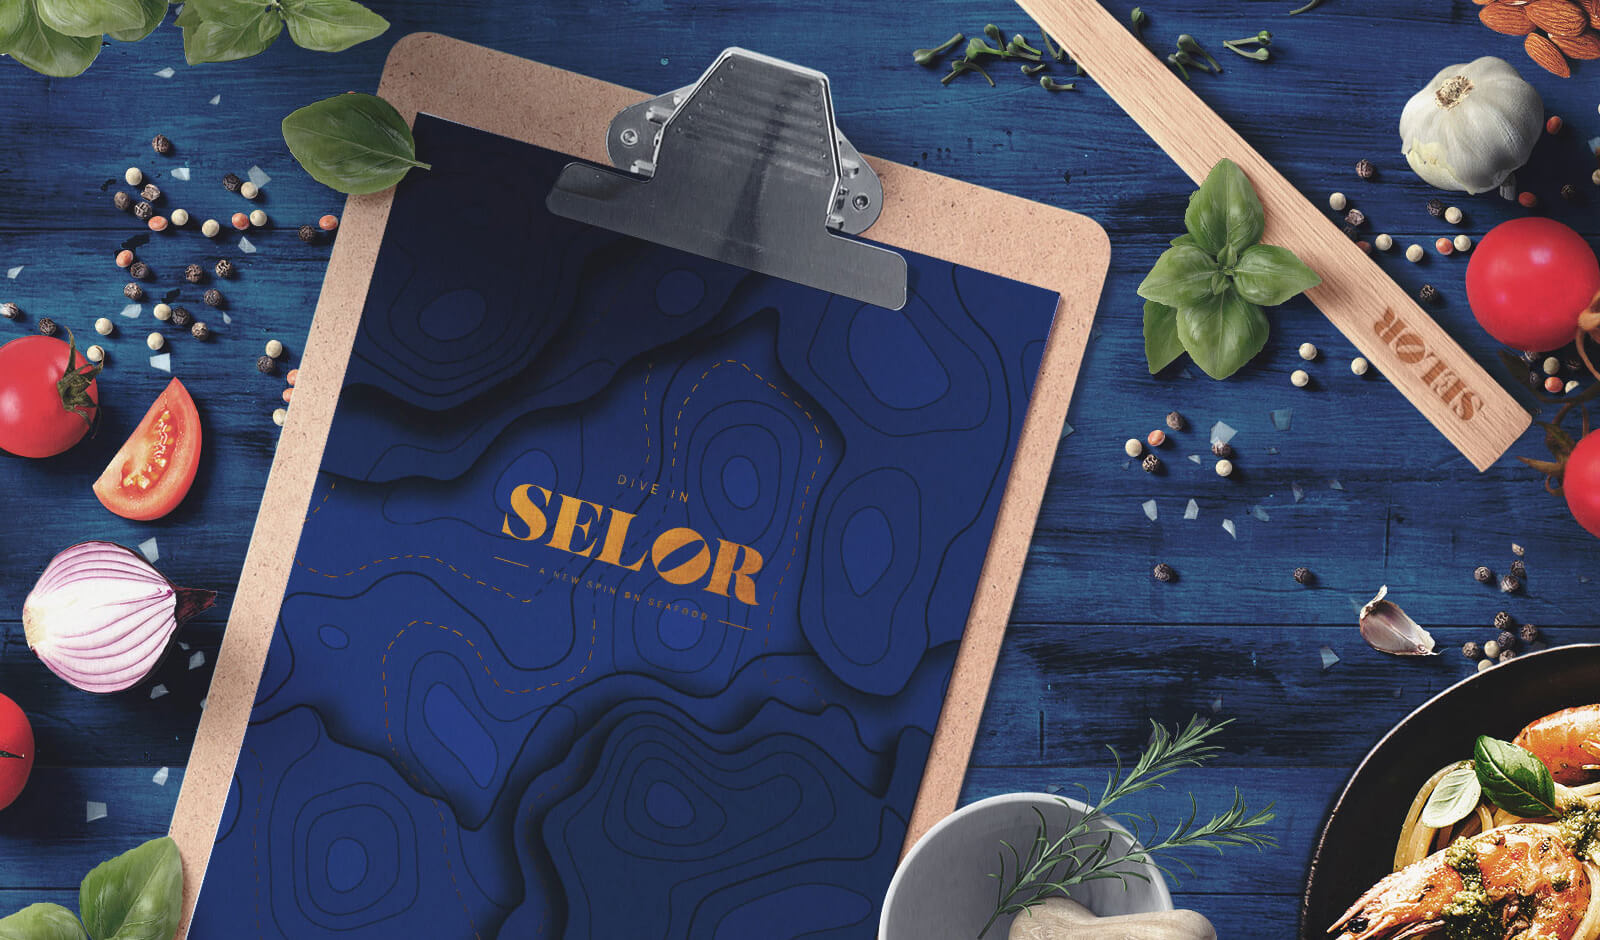 Identity design for SELOR